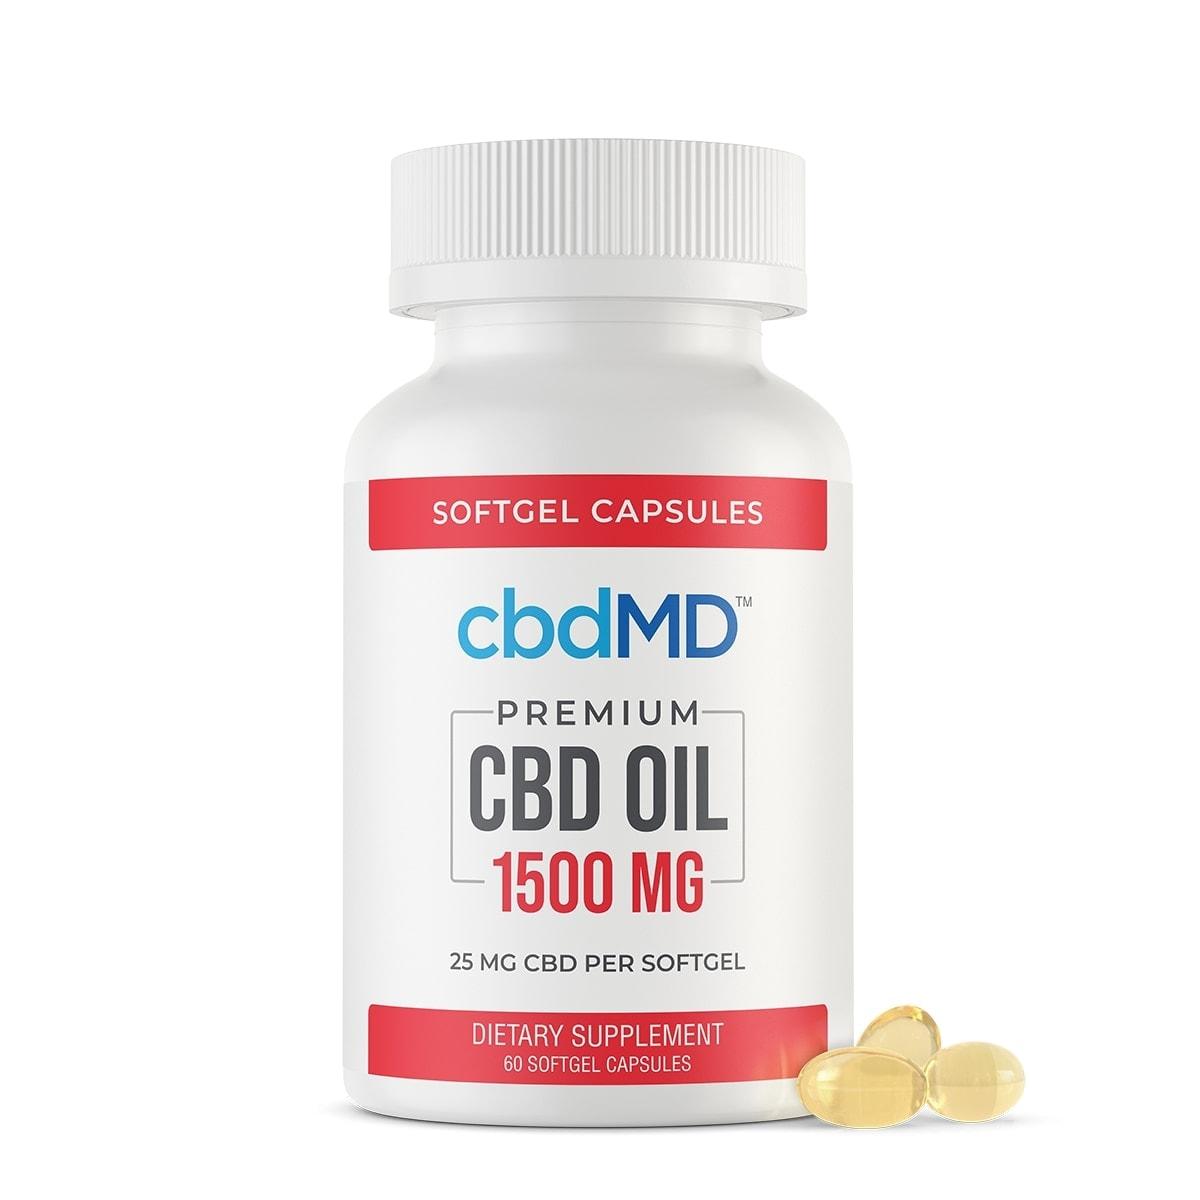 cbdMD, CBD Oil Softgel Capsules, Broad Spectrum THC-Free, 60-Count, 1500mg of CBD